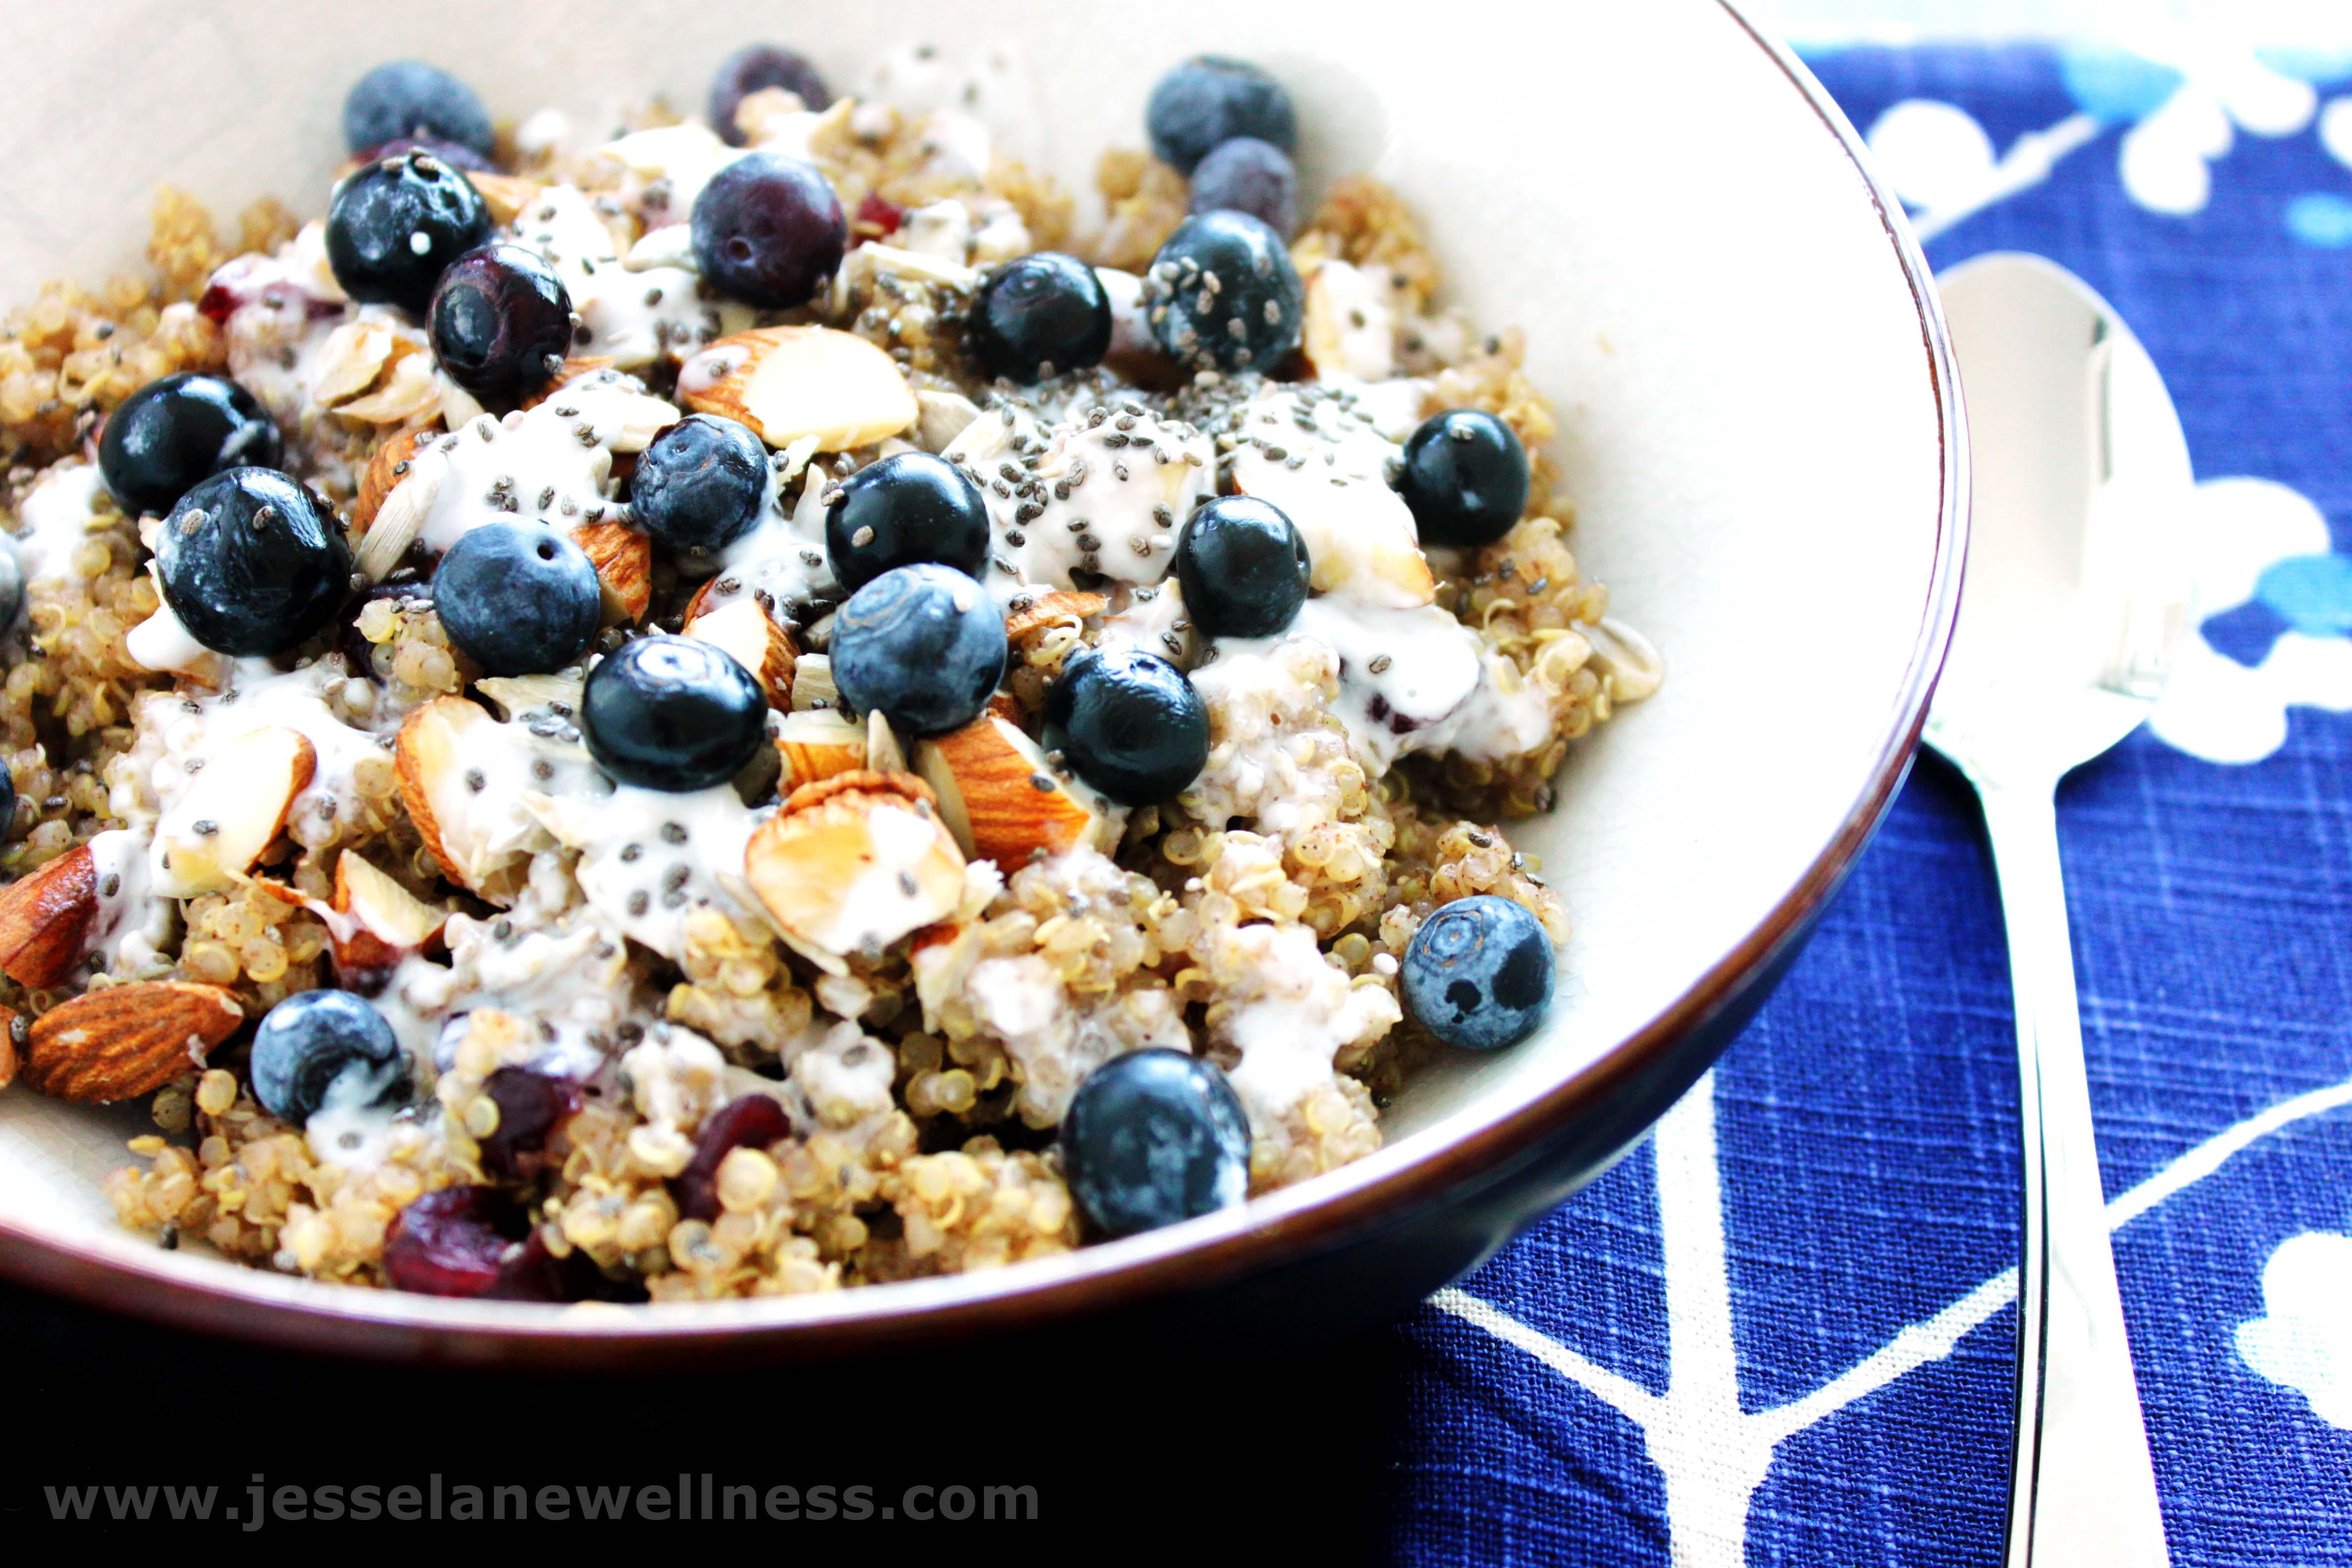 Quinoa Breakfast Recipes  Breakfast Quinoa Vegan and Gluten Free by Jesse Lane